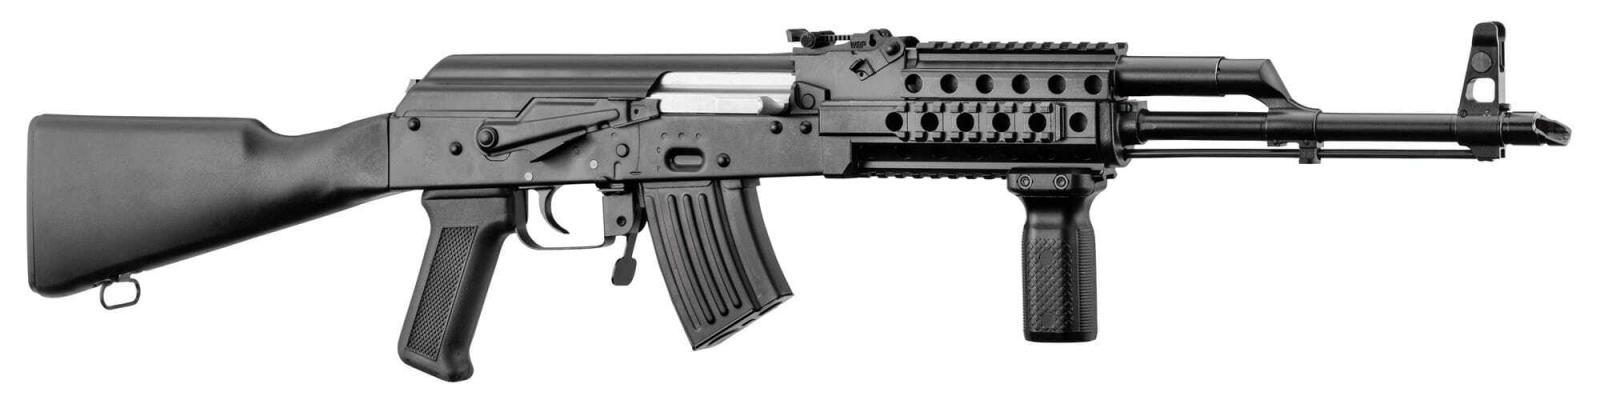 Carabine WBP JACK Cal 7.62x39